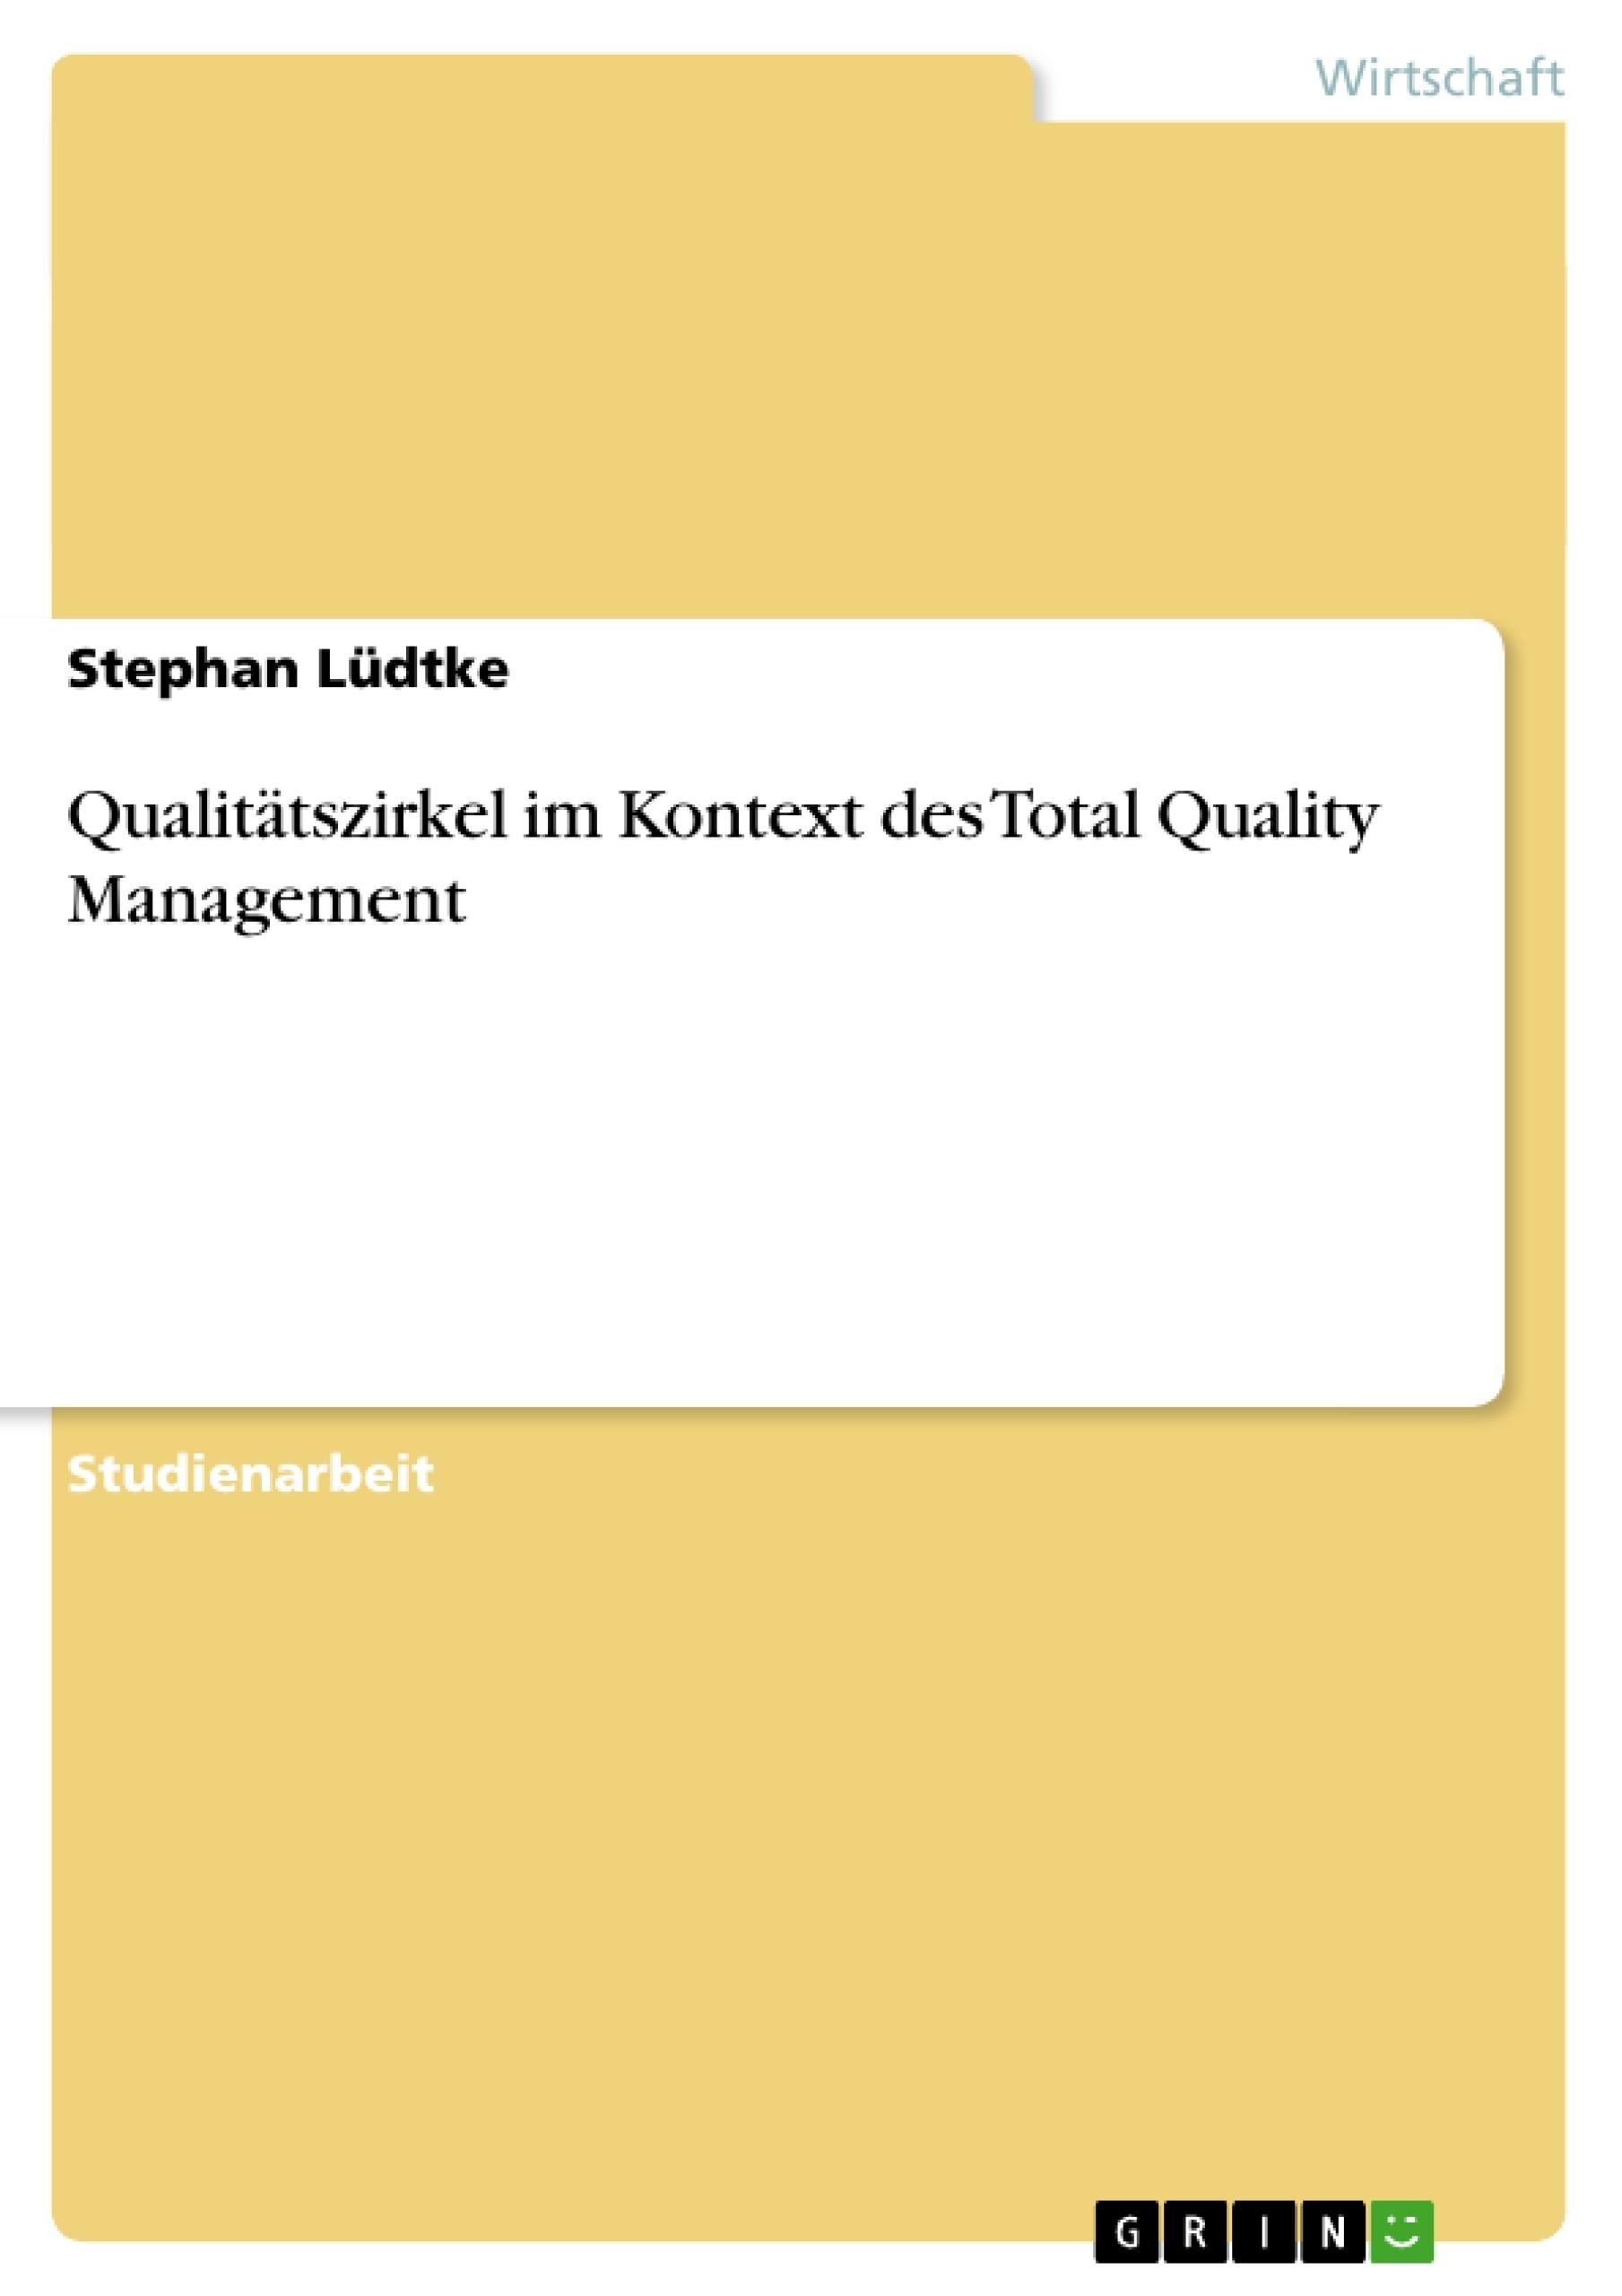 Titel: Qualitätszirkel im Kontext des Total Quality Management